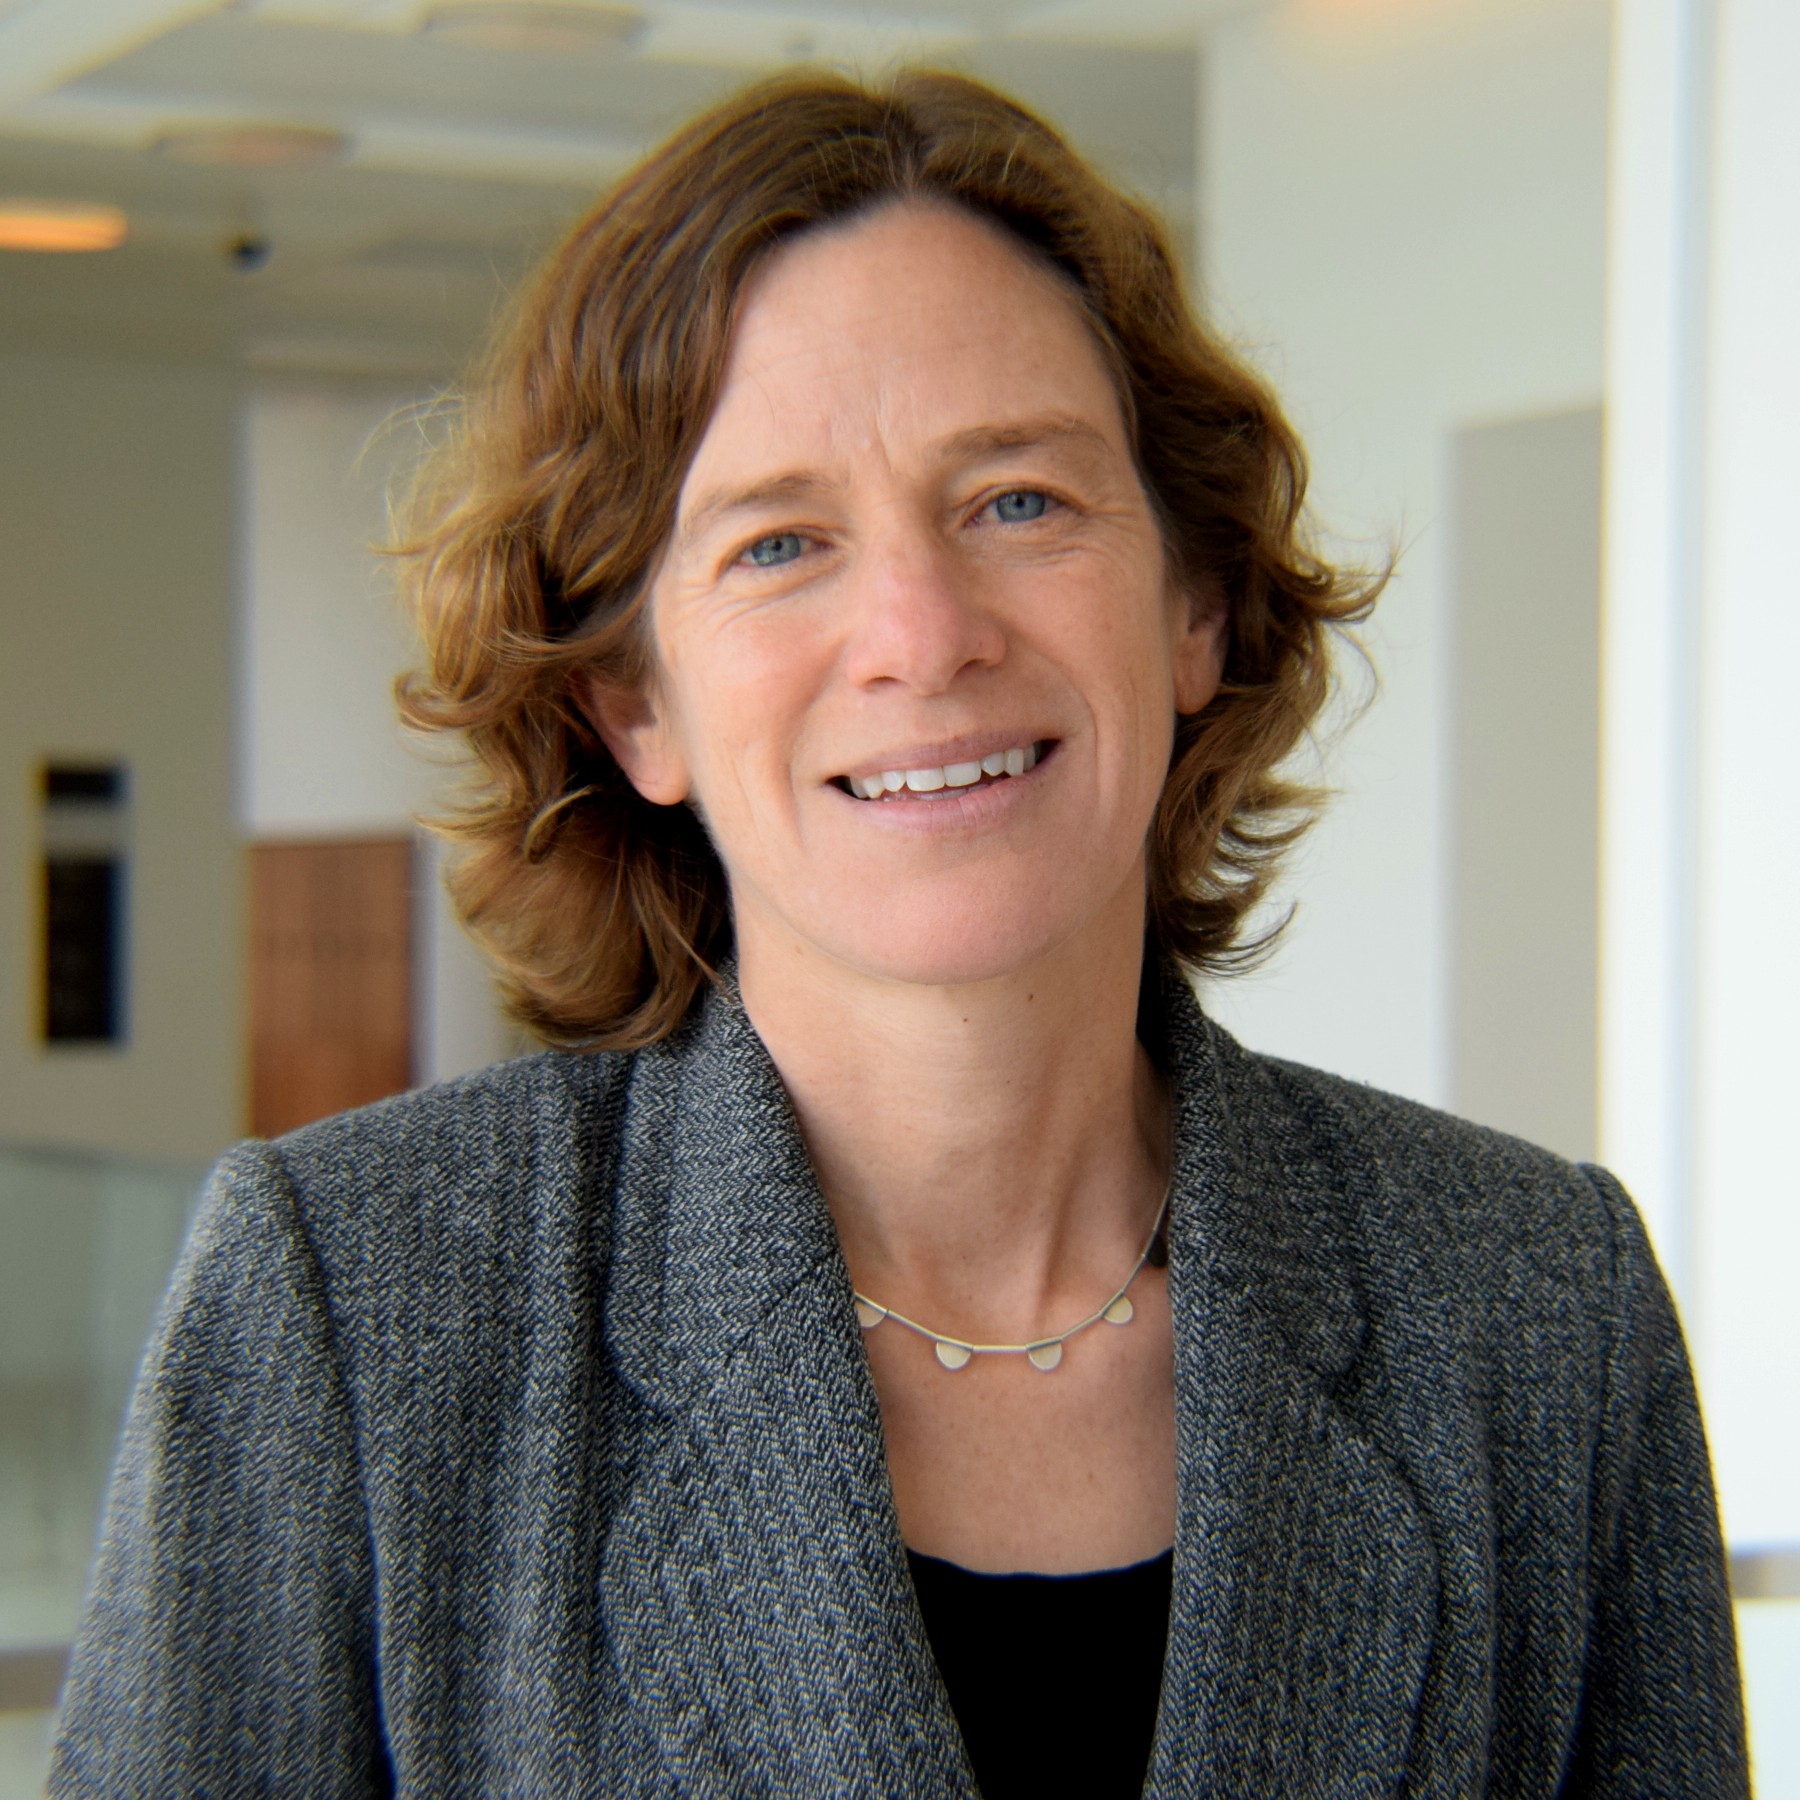 Professor Amanda Frost